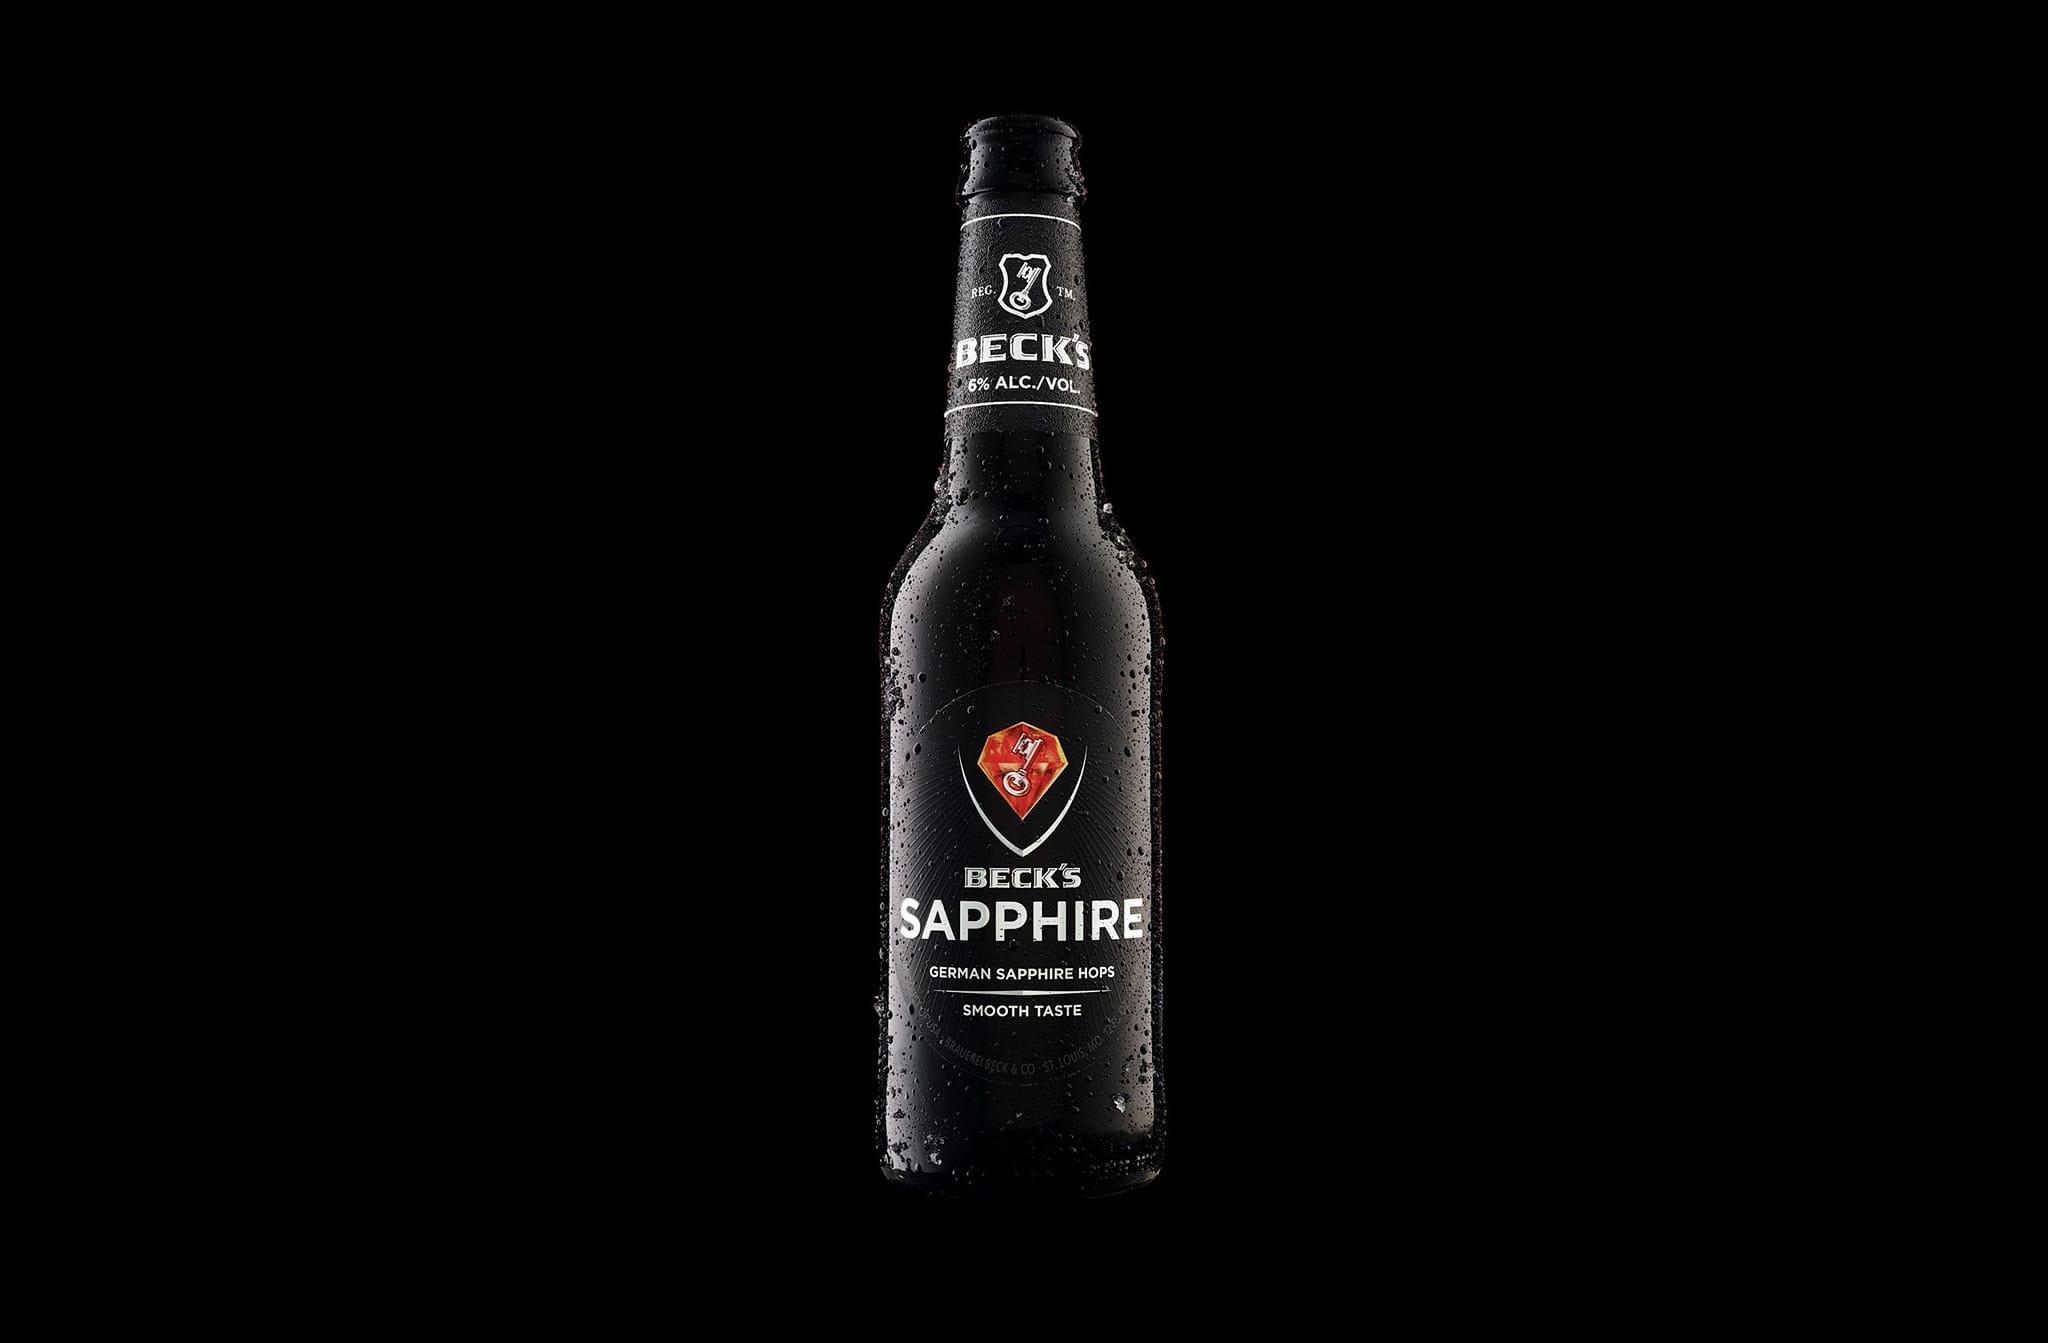 Anheuser-Busch Debuts Beck's Sapphire Beer